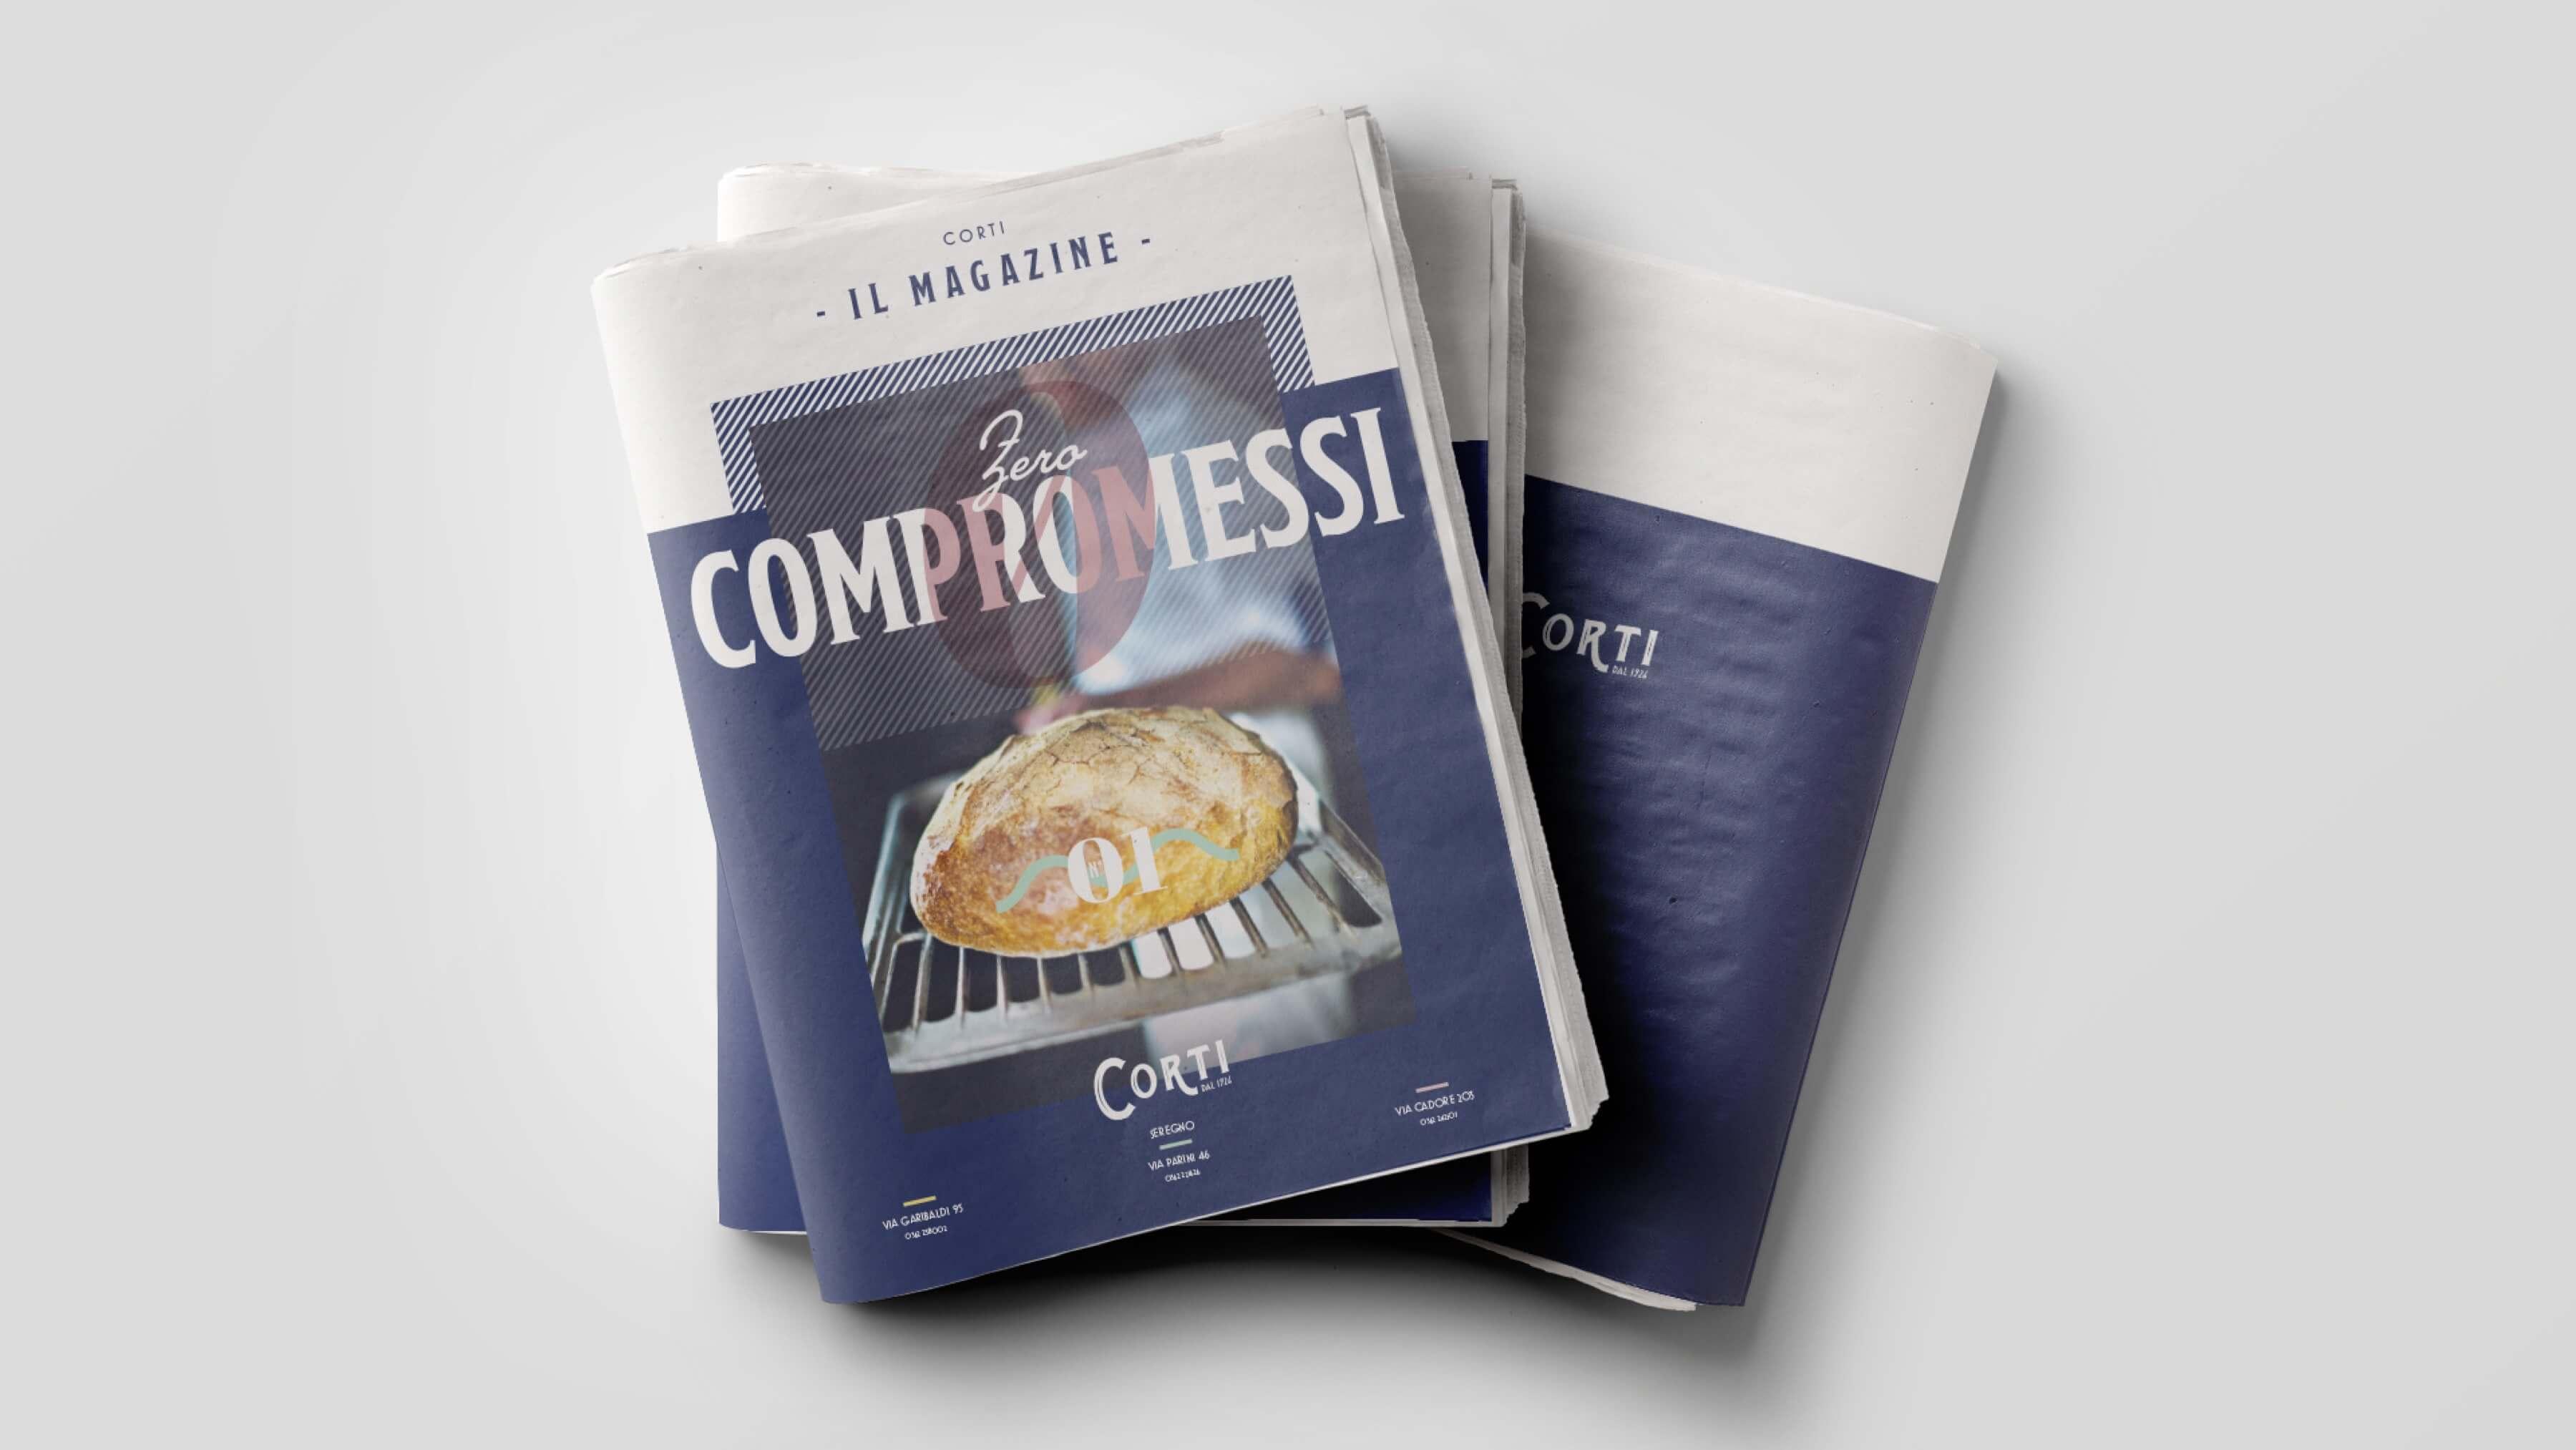 Corti Brand Magazine - Blossom